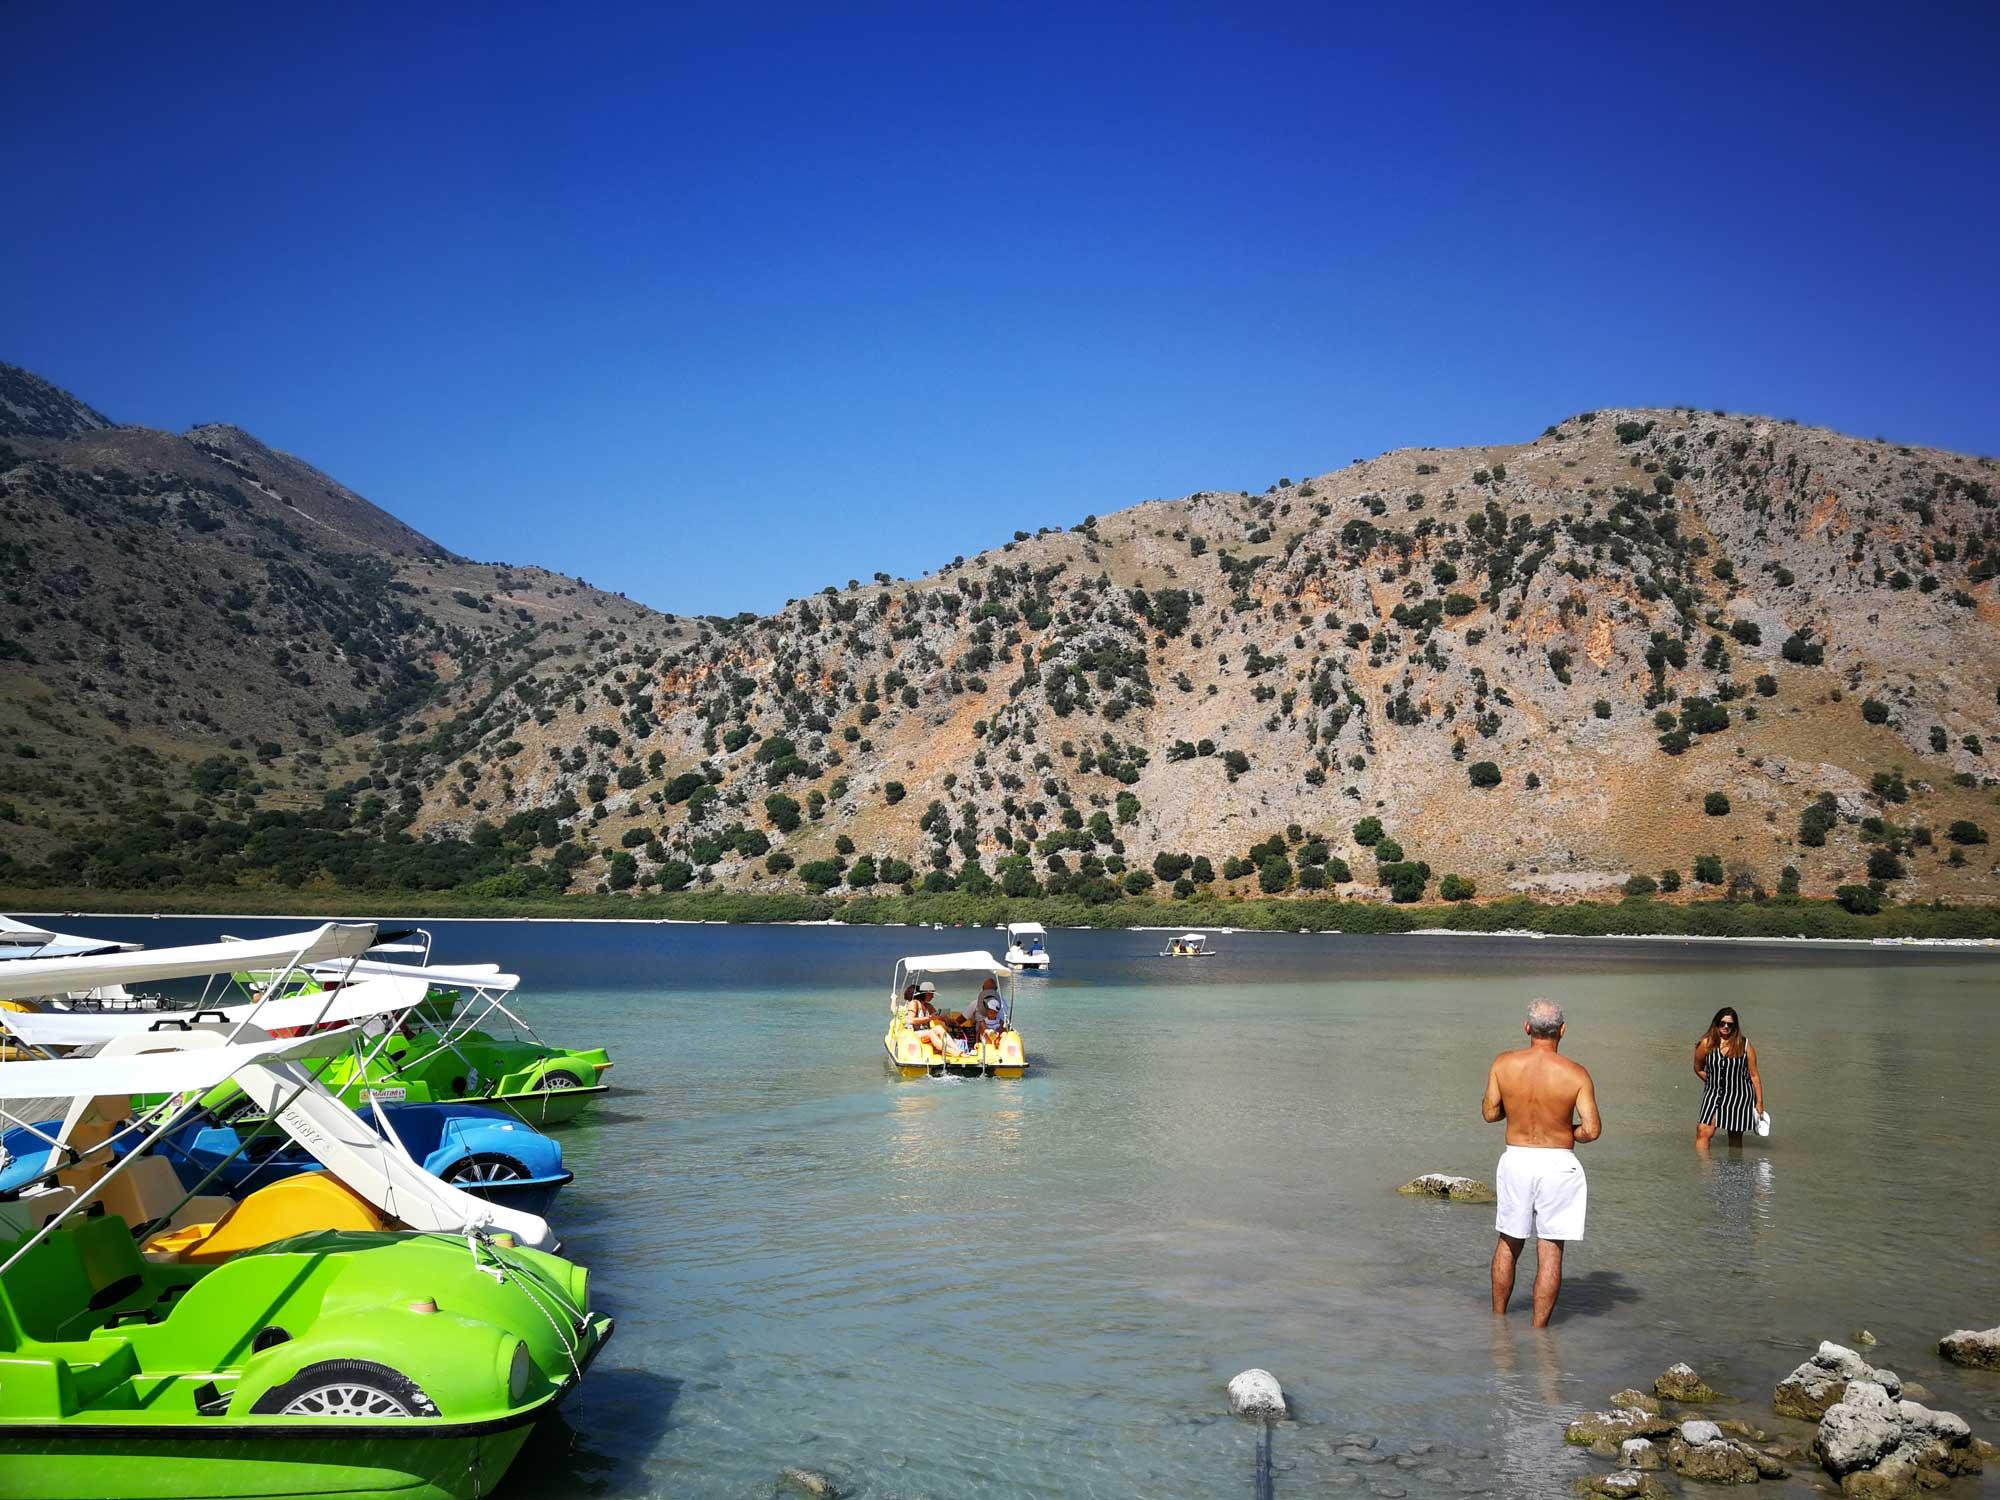 kournas: paddle boats on the lake